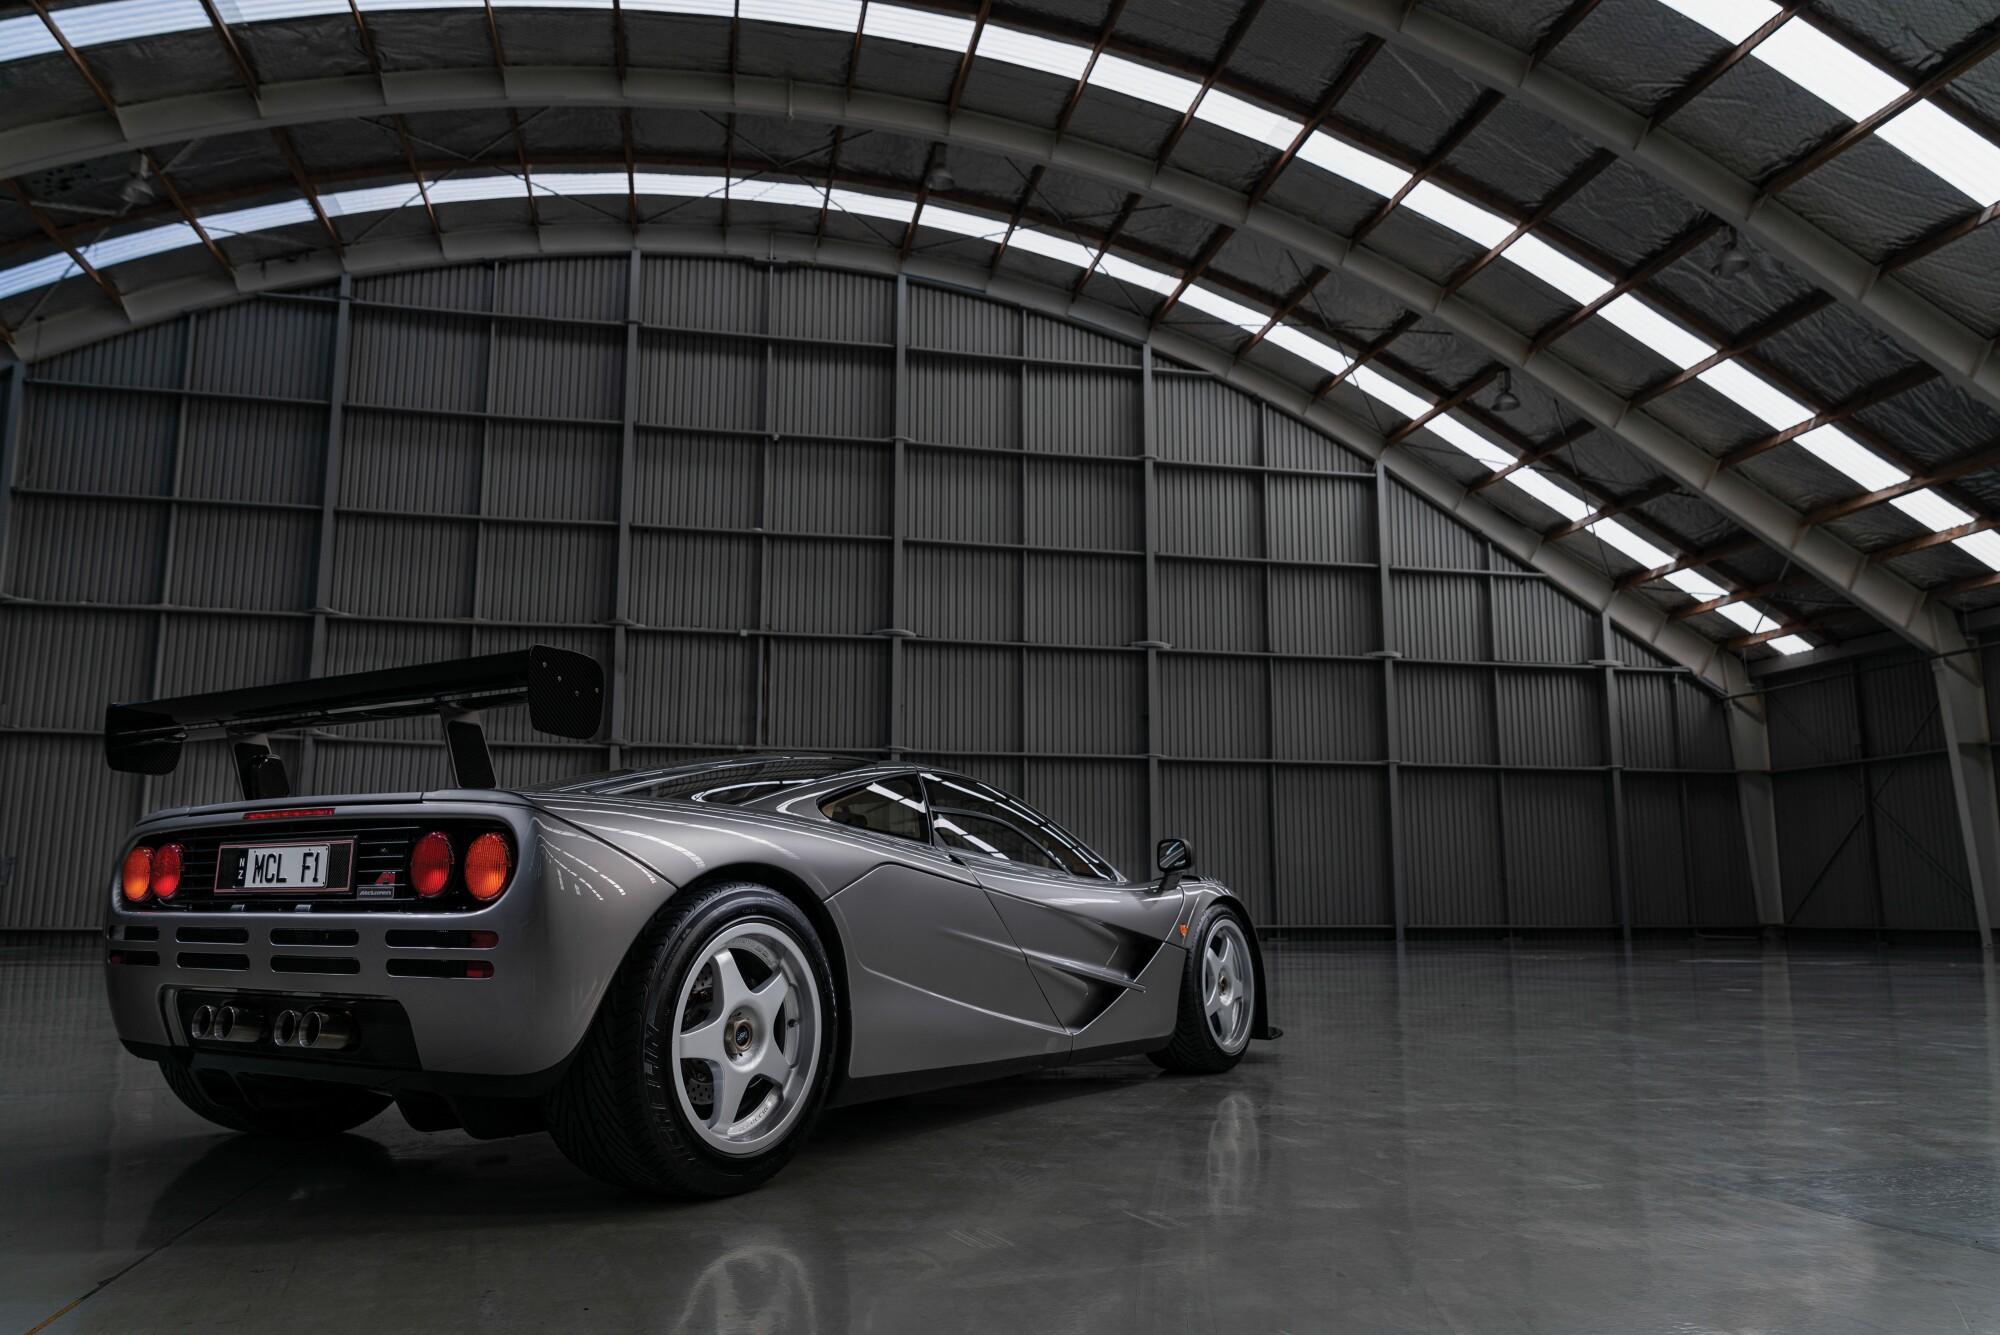 1994-McLaren-F1--LM-Specification-6.jpg